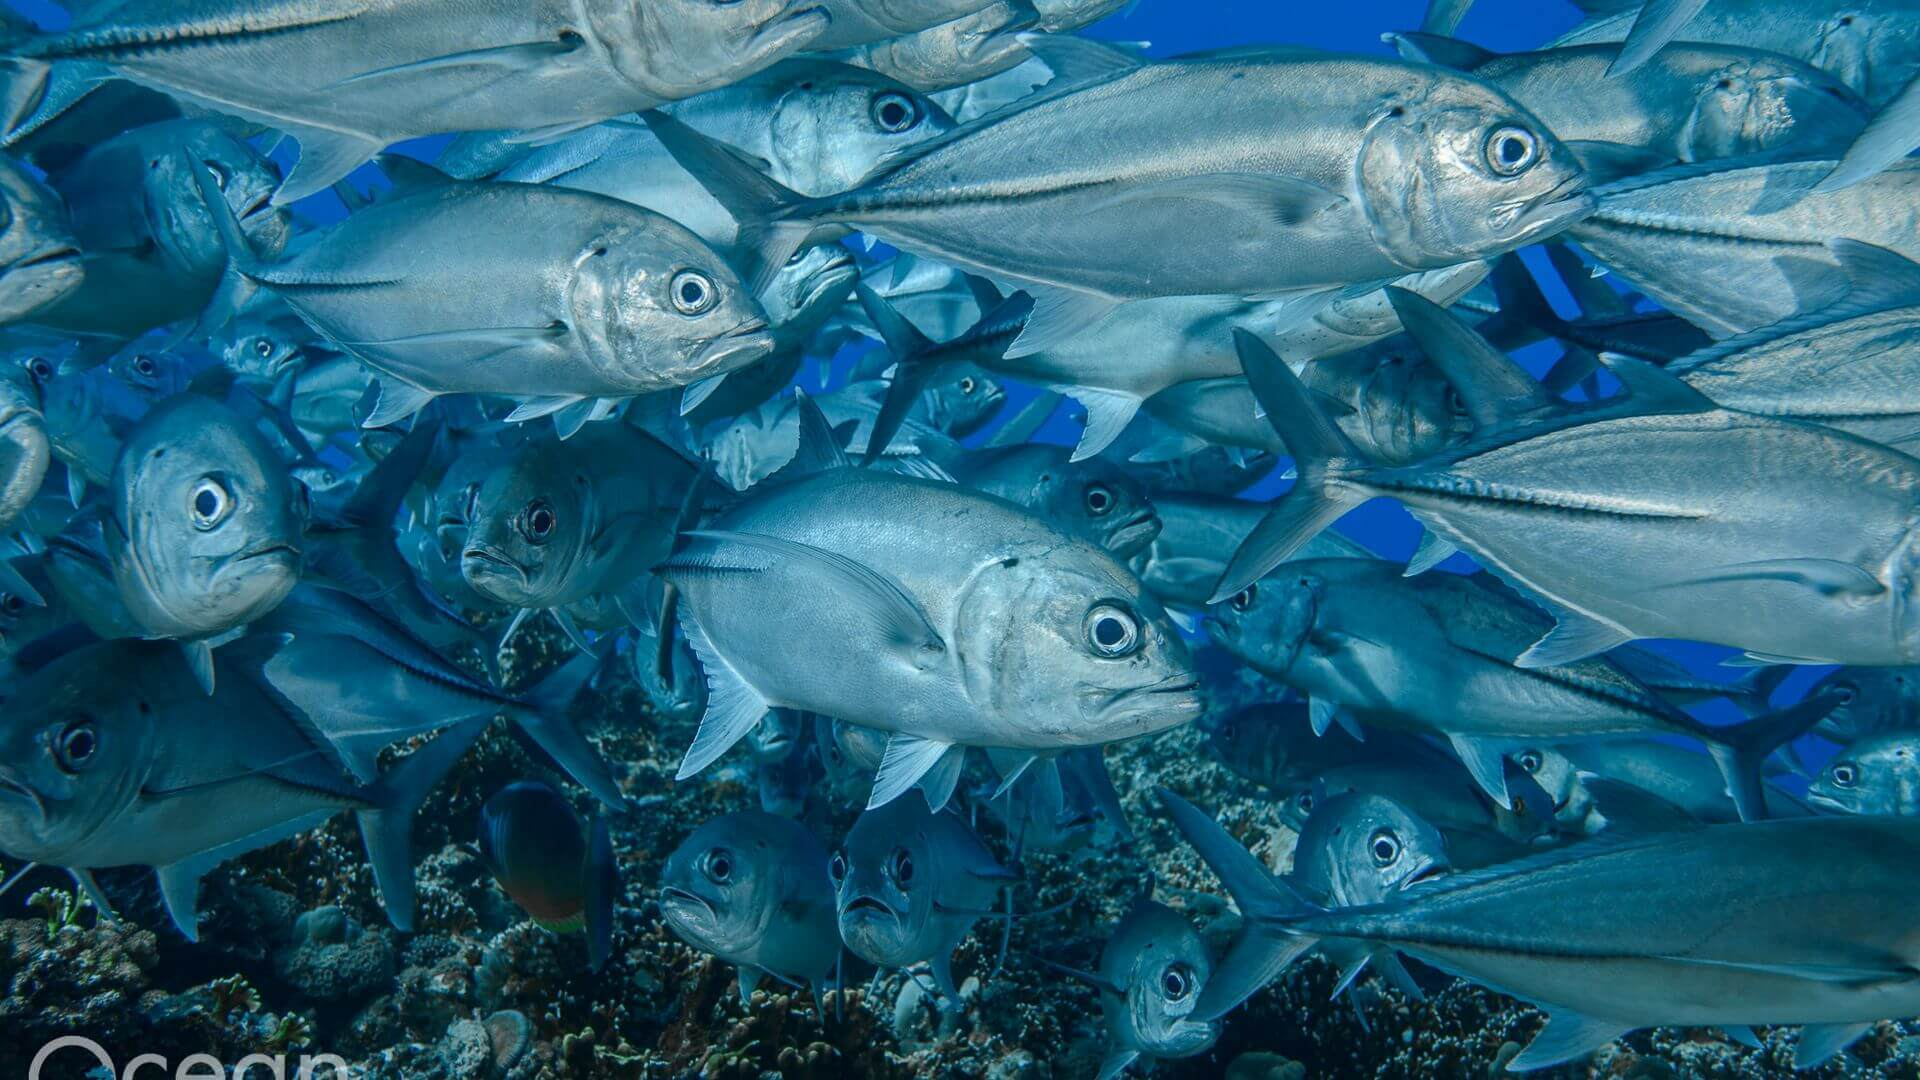 Solomon Islands Liveaboard Diving Trips | Bilikiki Cruises